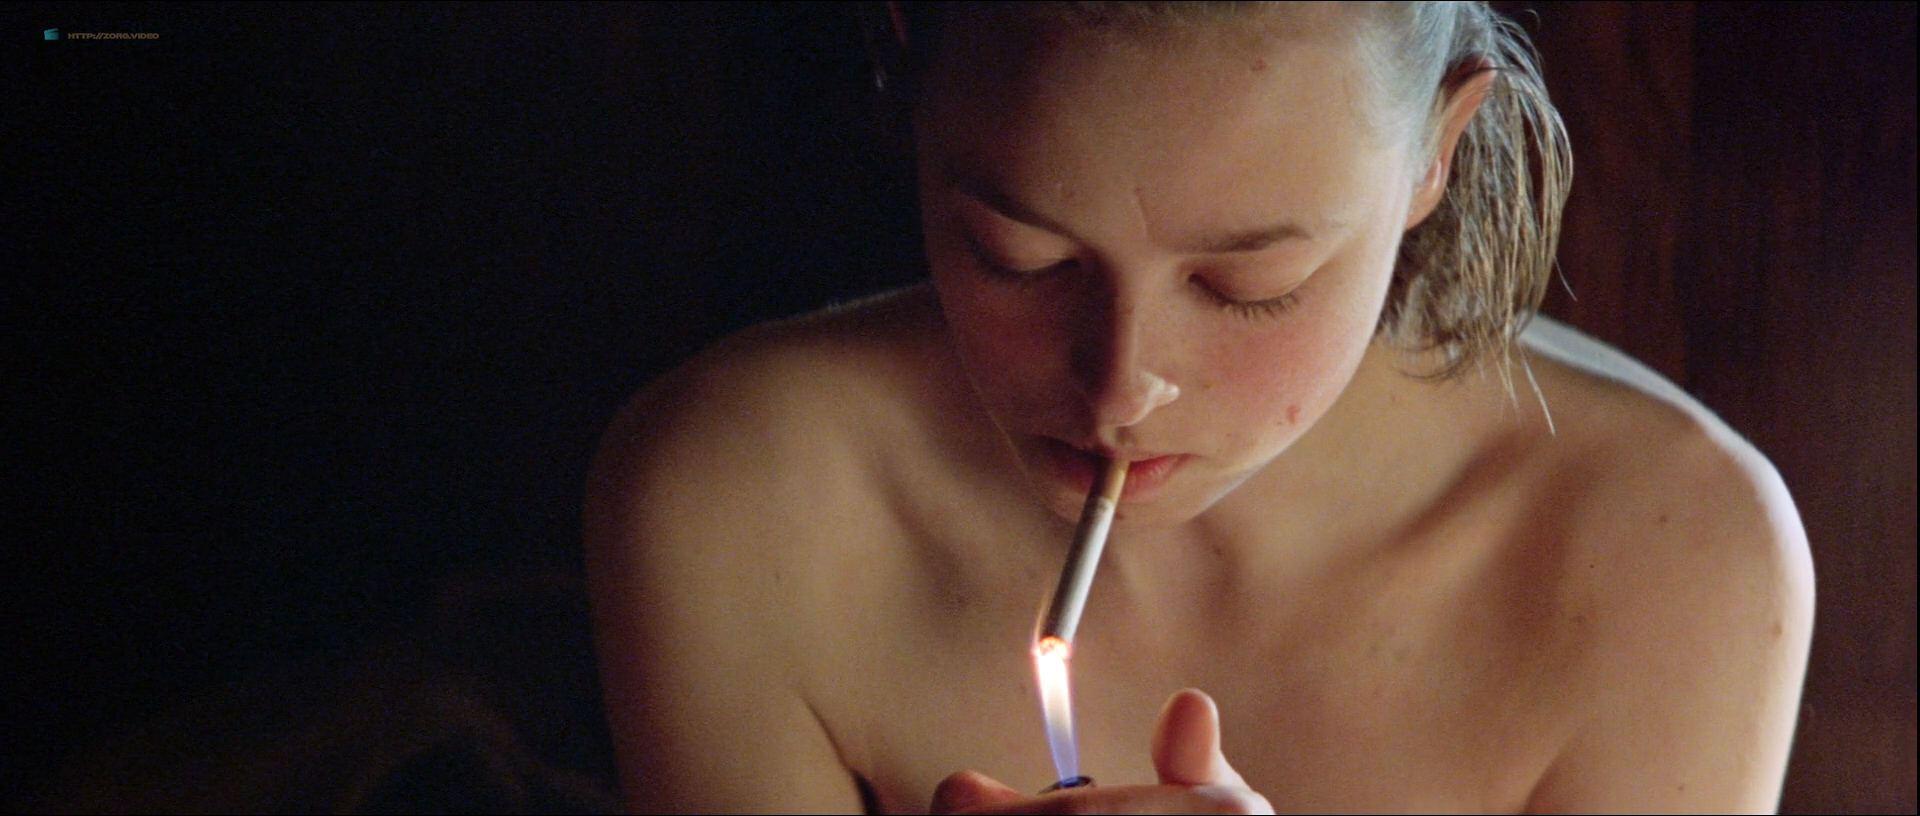 0919023556012_14_Lara-Belmont-nude-bush-and-topless-Tilda-Swinton-Aisling-O_Sullivan-nude-too-The-War-Zone-1999-HD-1080p-Web-004.jpg